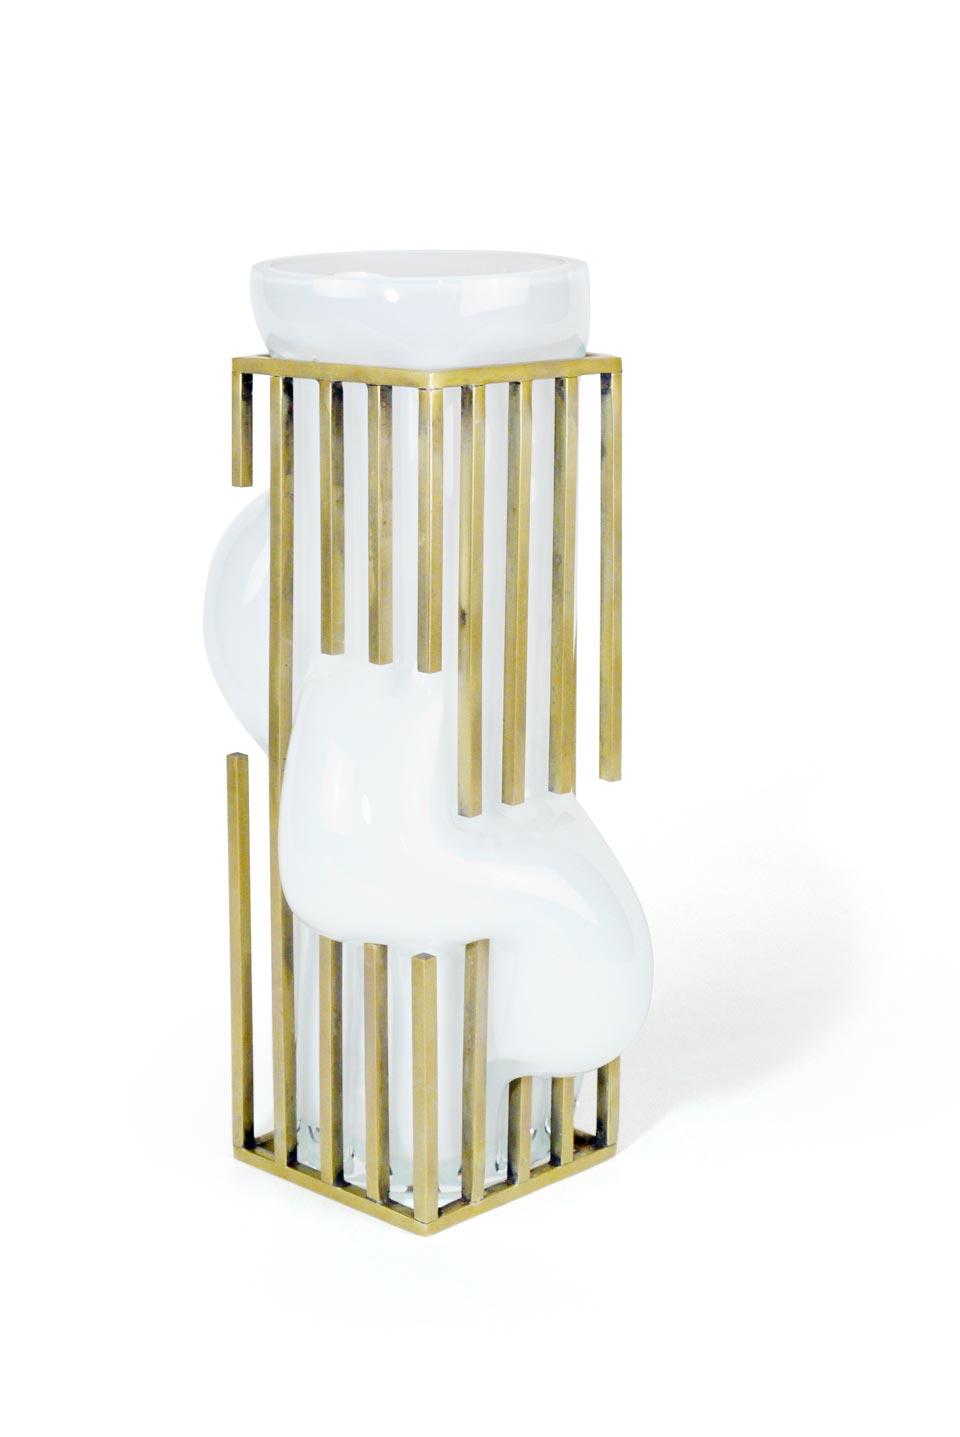 Vase haut Freedom en verre soufflé opale blanc. Vanessa Mitrani.